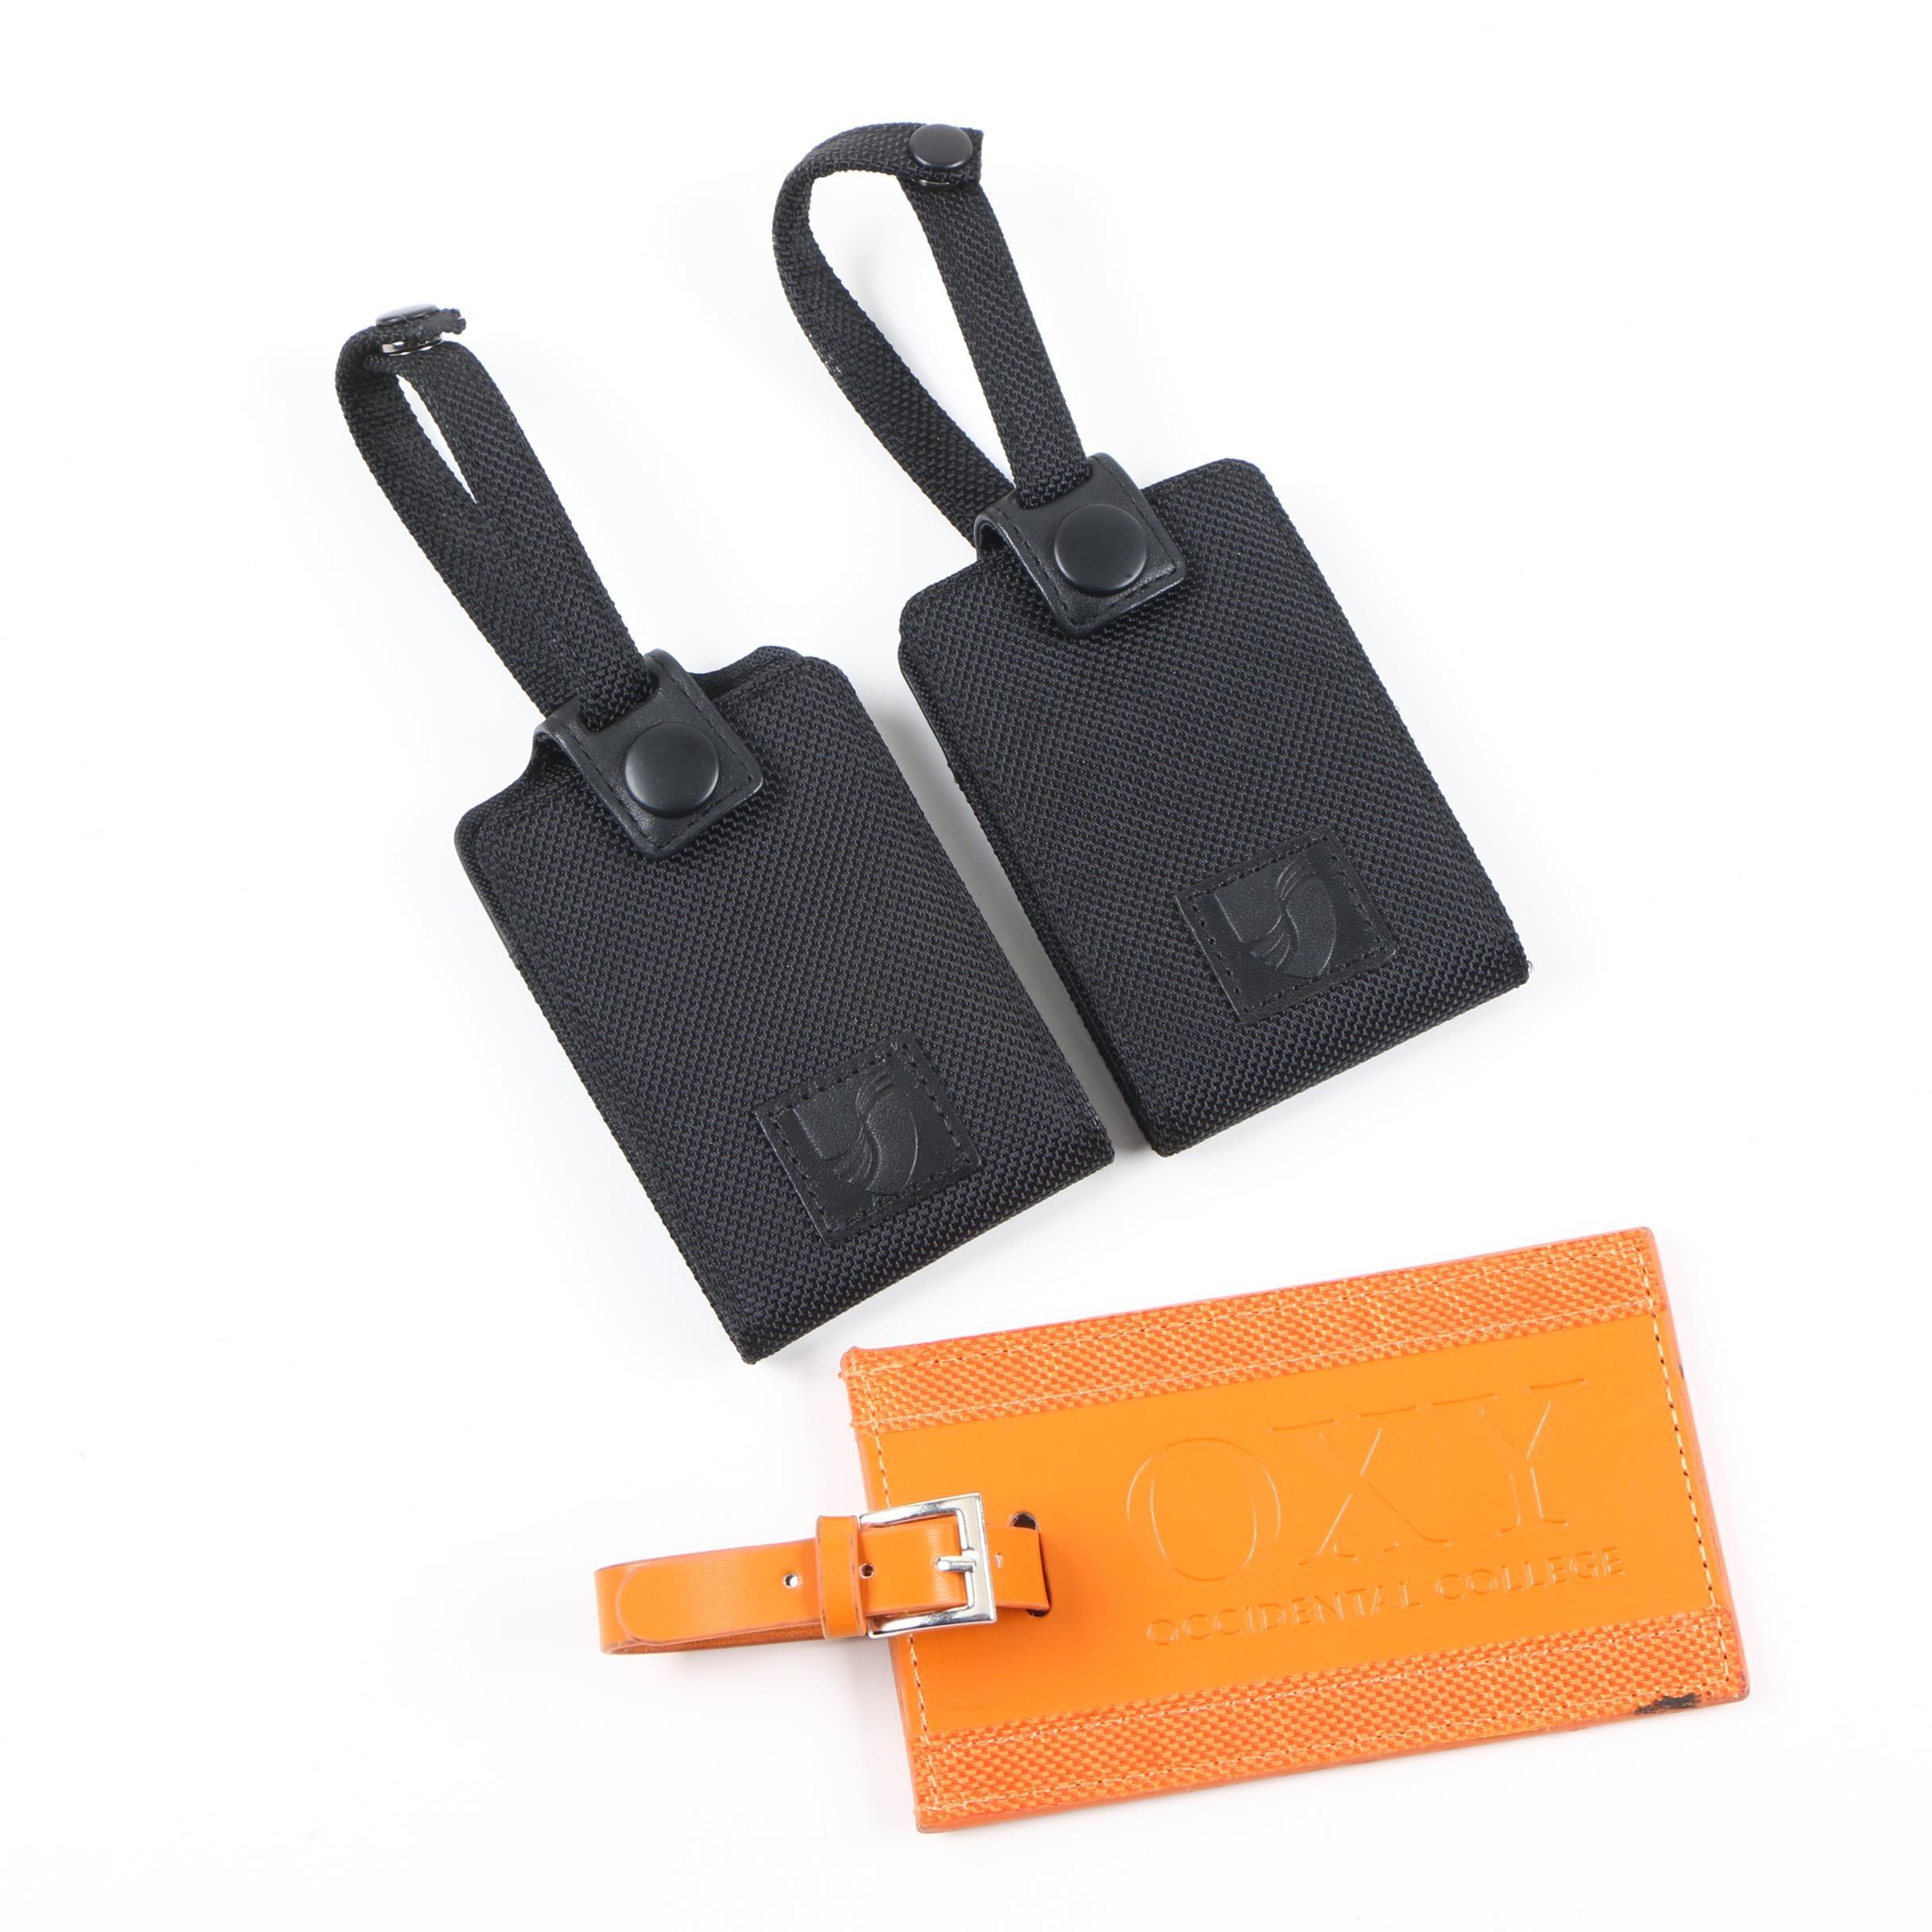 Luggage Tags Including Tumi